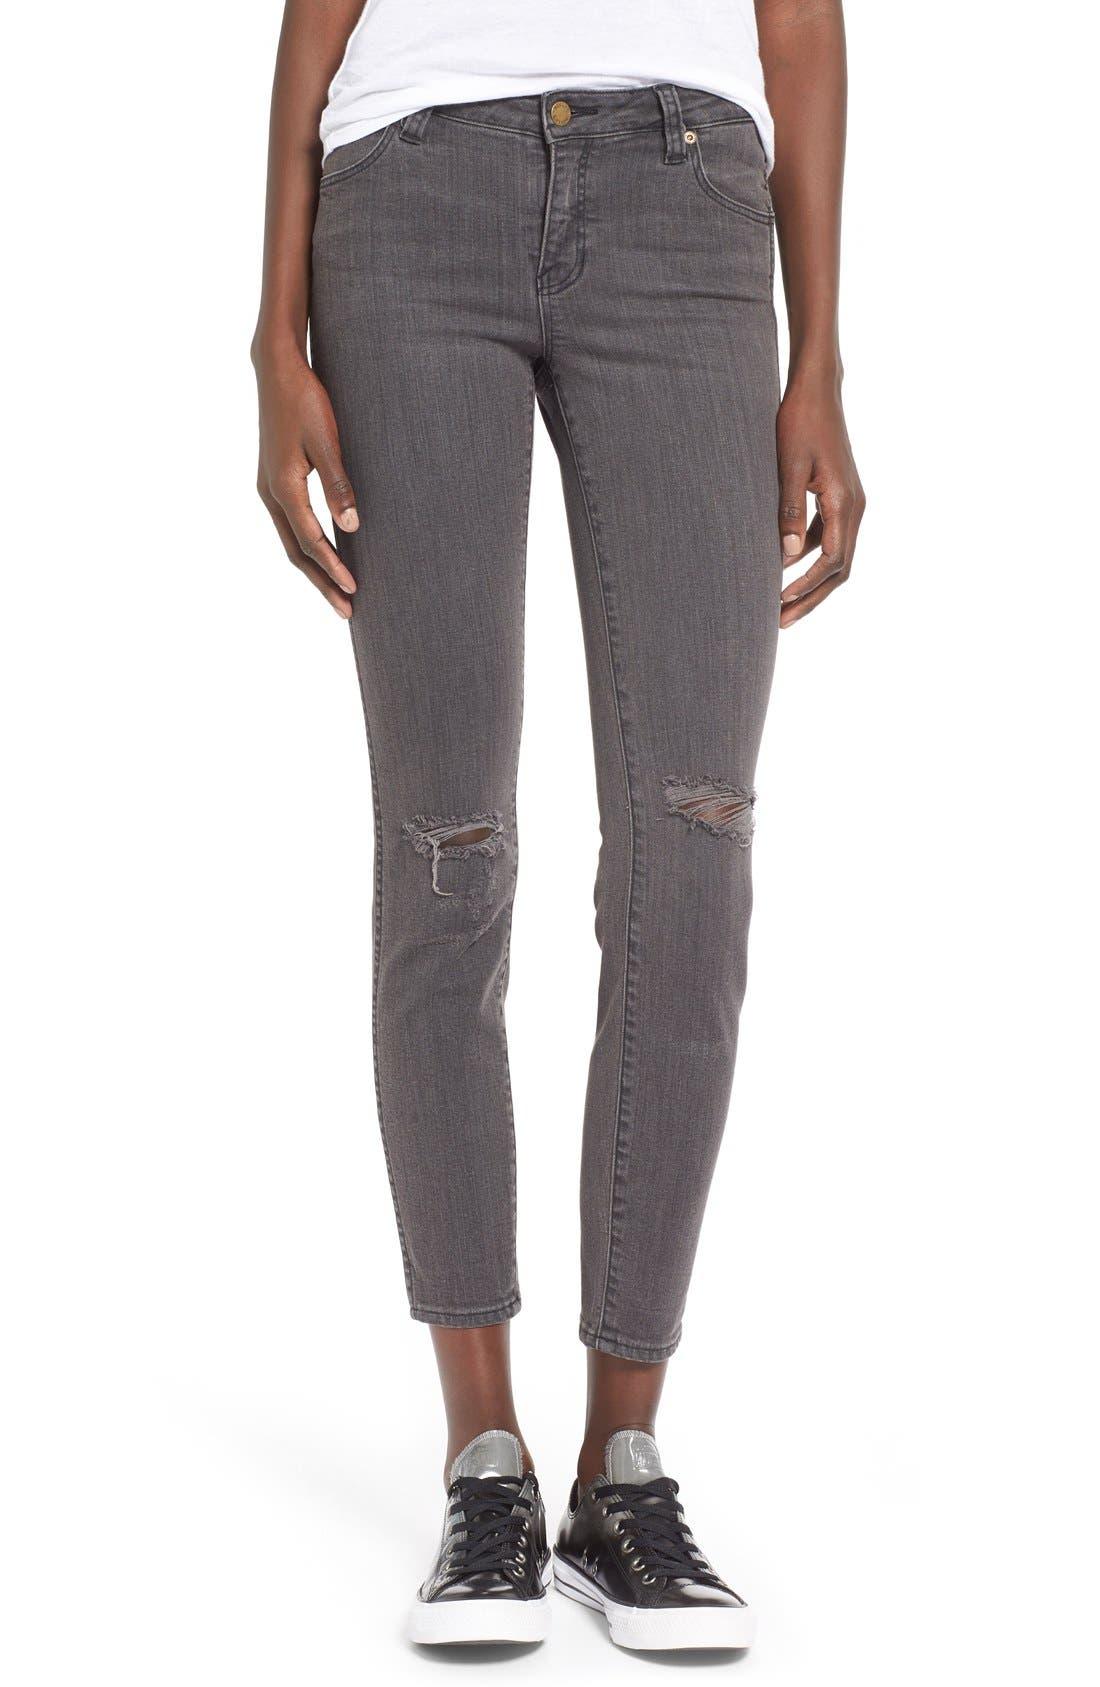 Alternate Image 1 Selected - Rolla's 'Breakers' Distressed Skinny Jeans (Beaten Black)